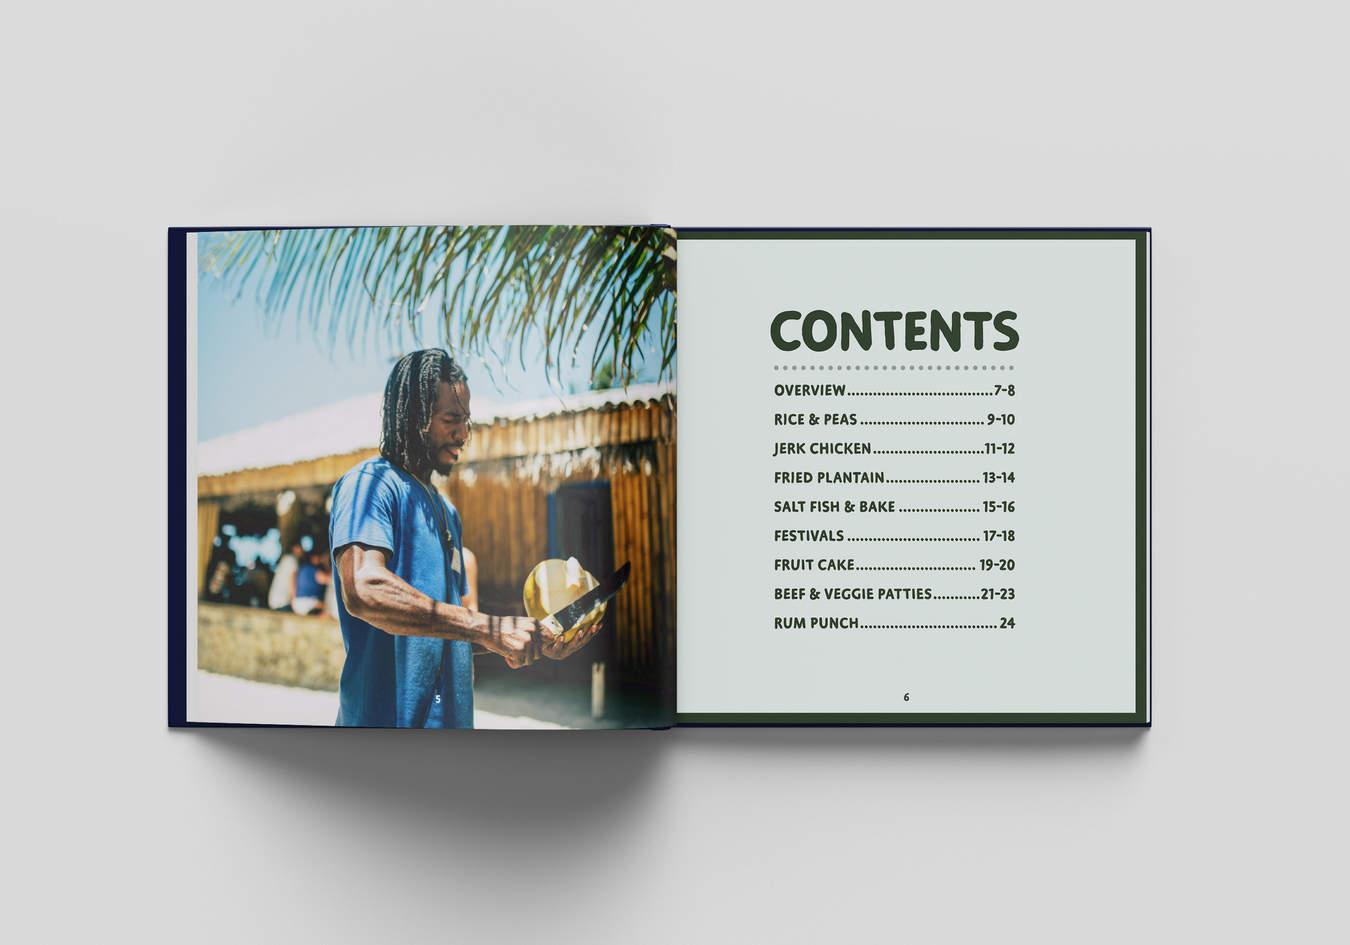 jm contents page mockup.jpg